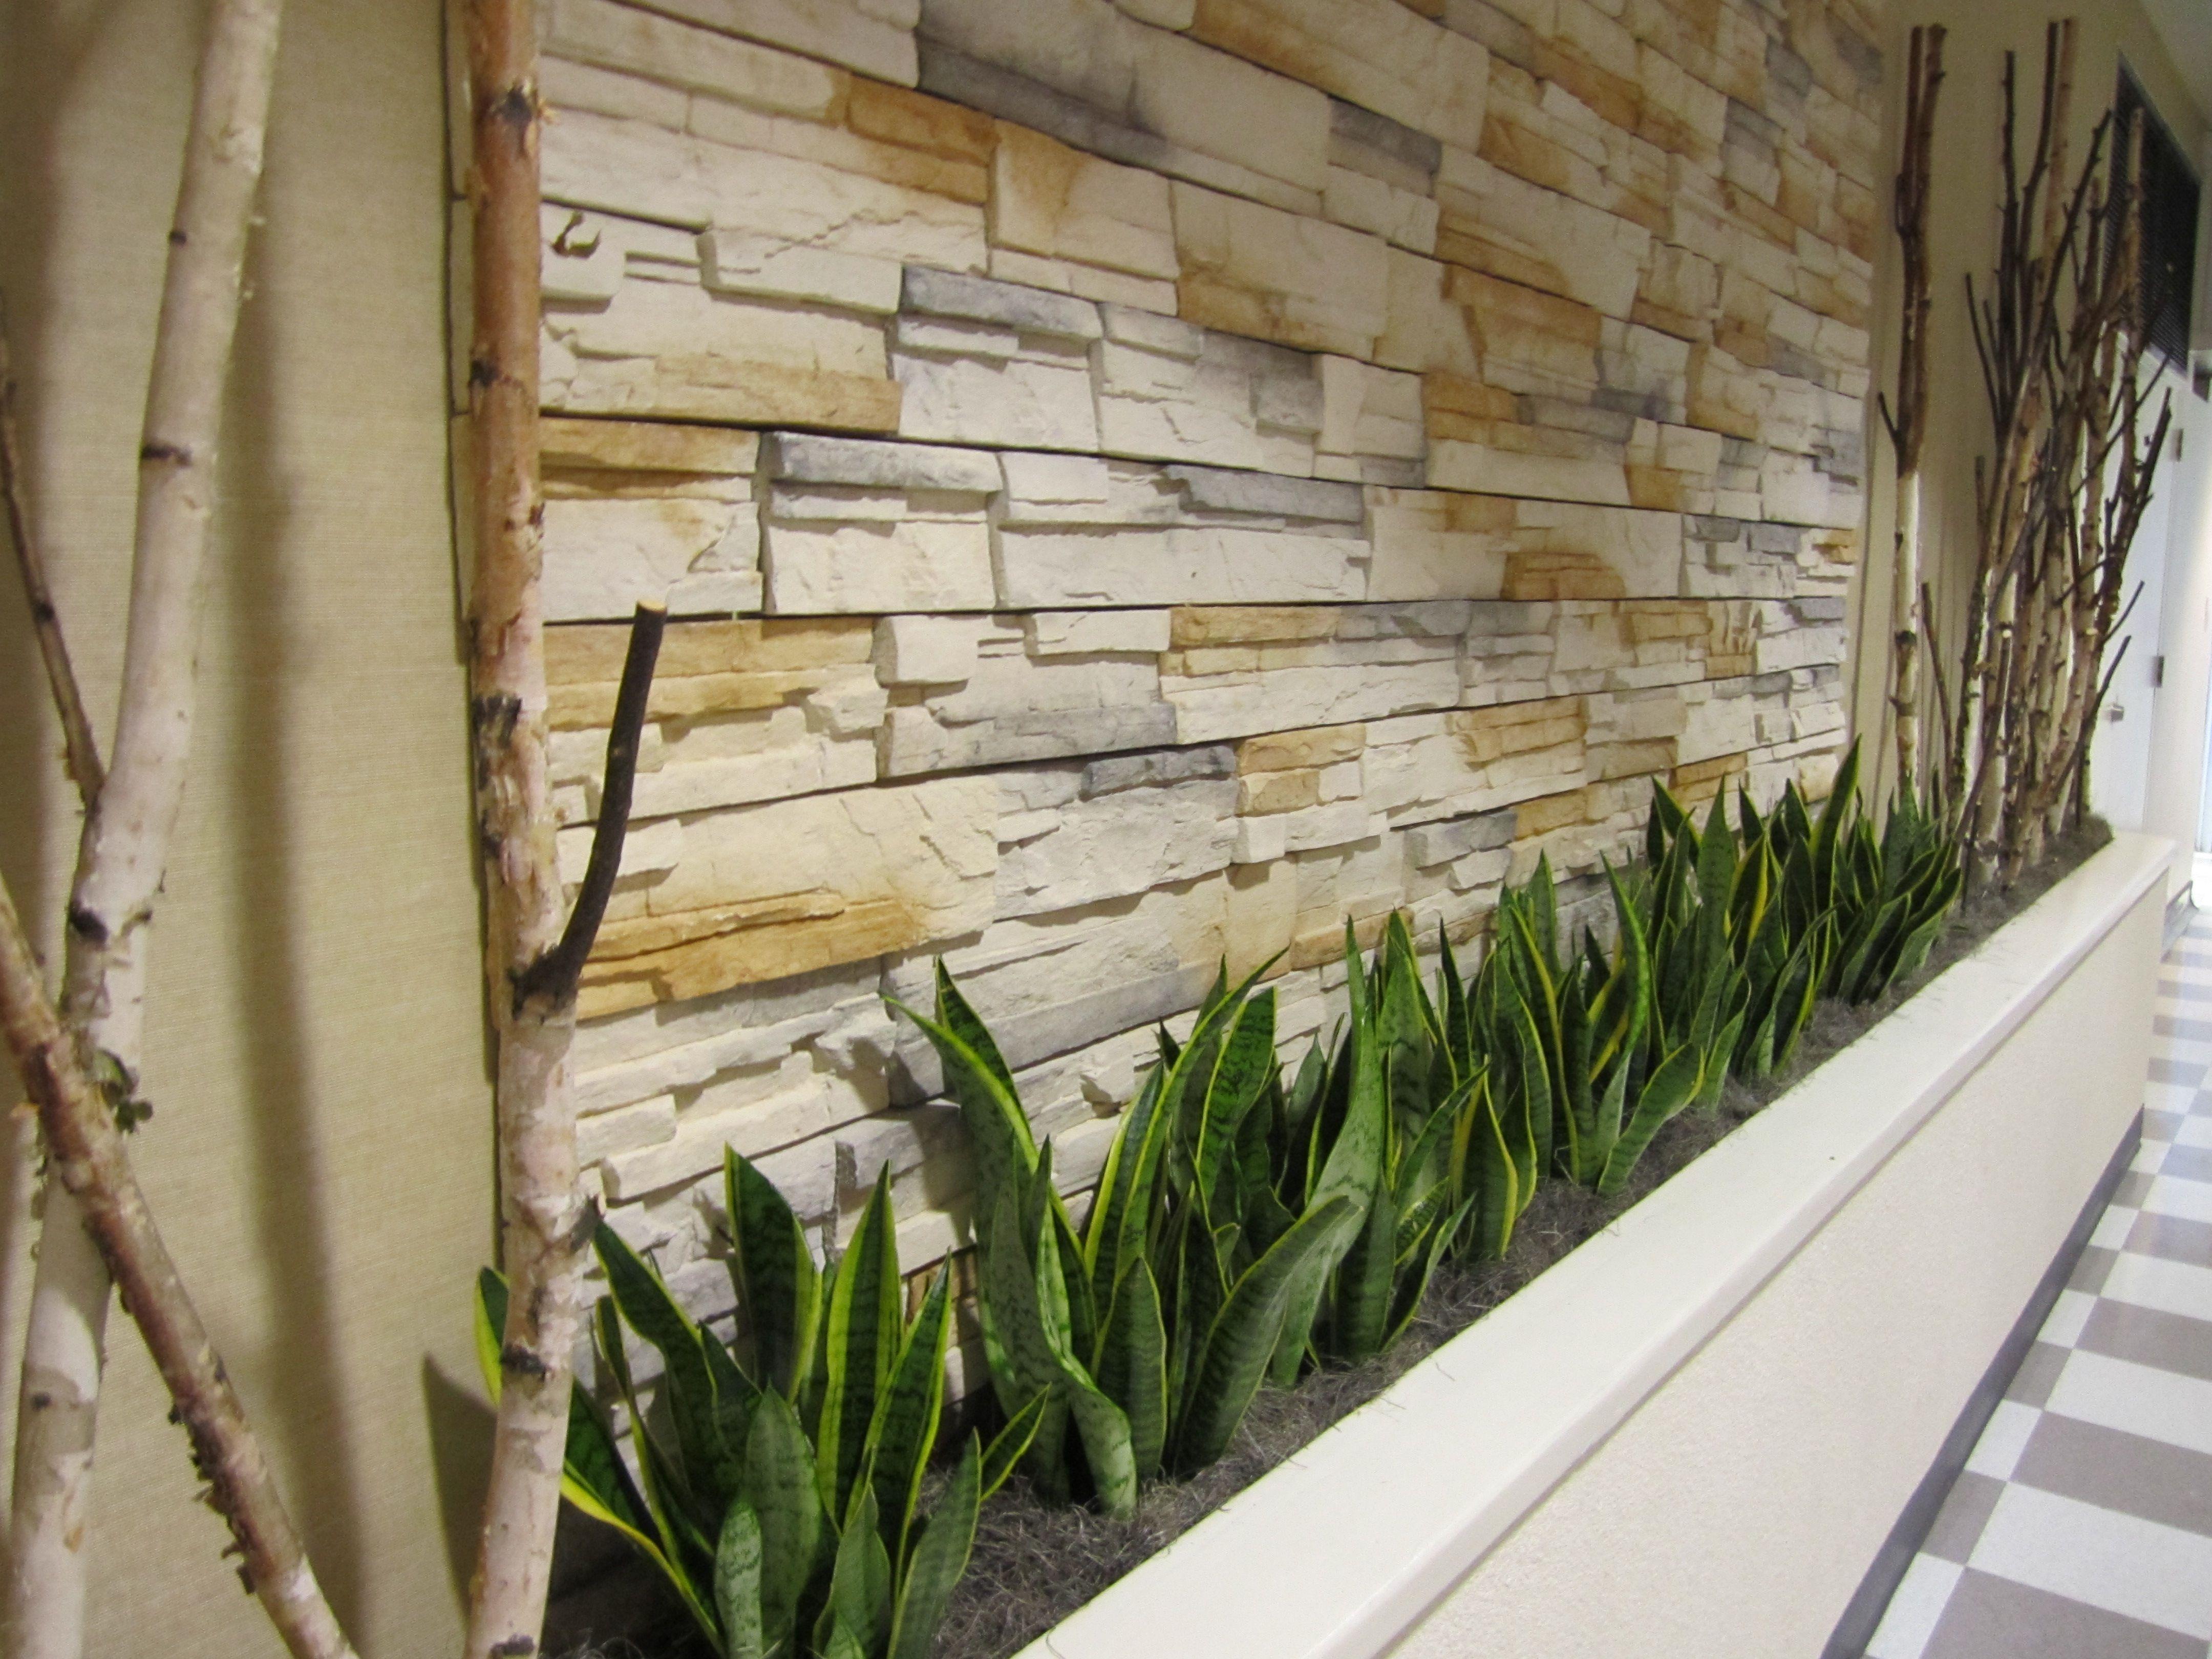 Design Interior Plant Design de jardins inverno plants doors and interiors indoor plantsplant